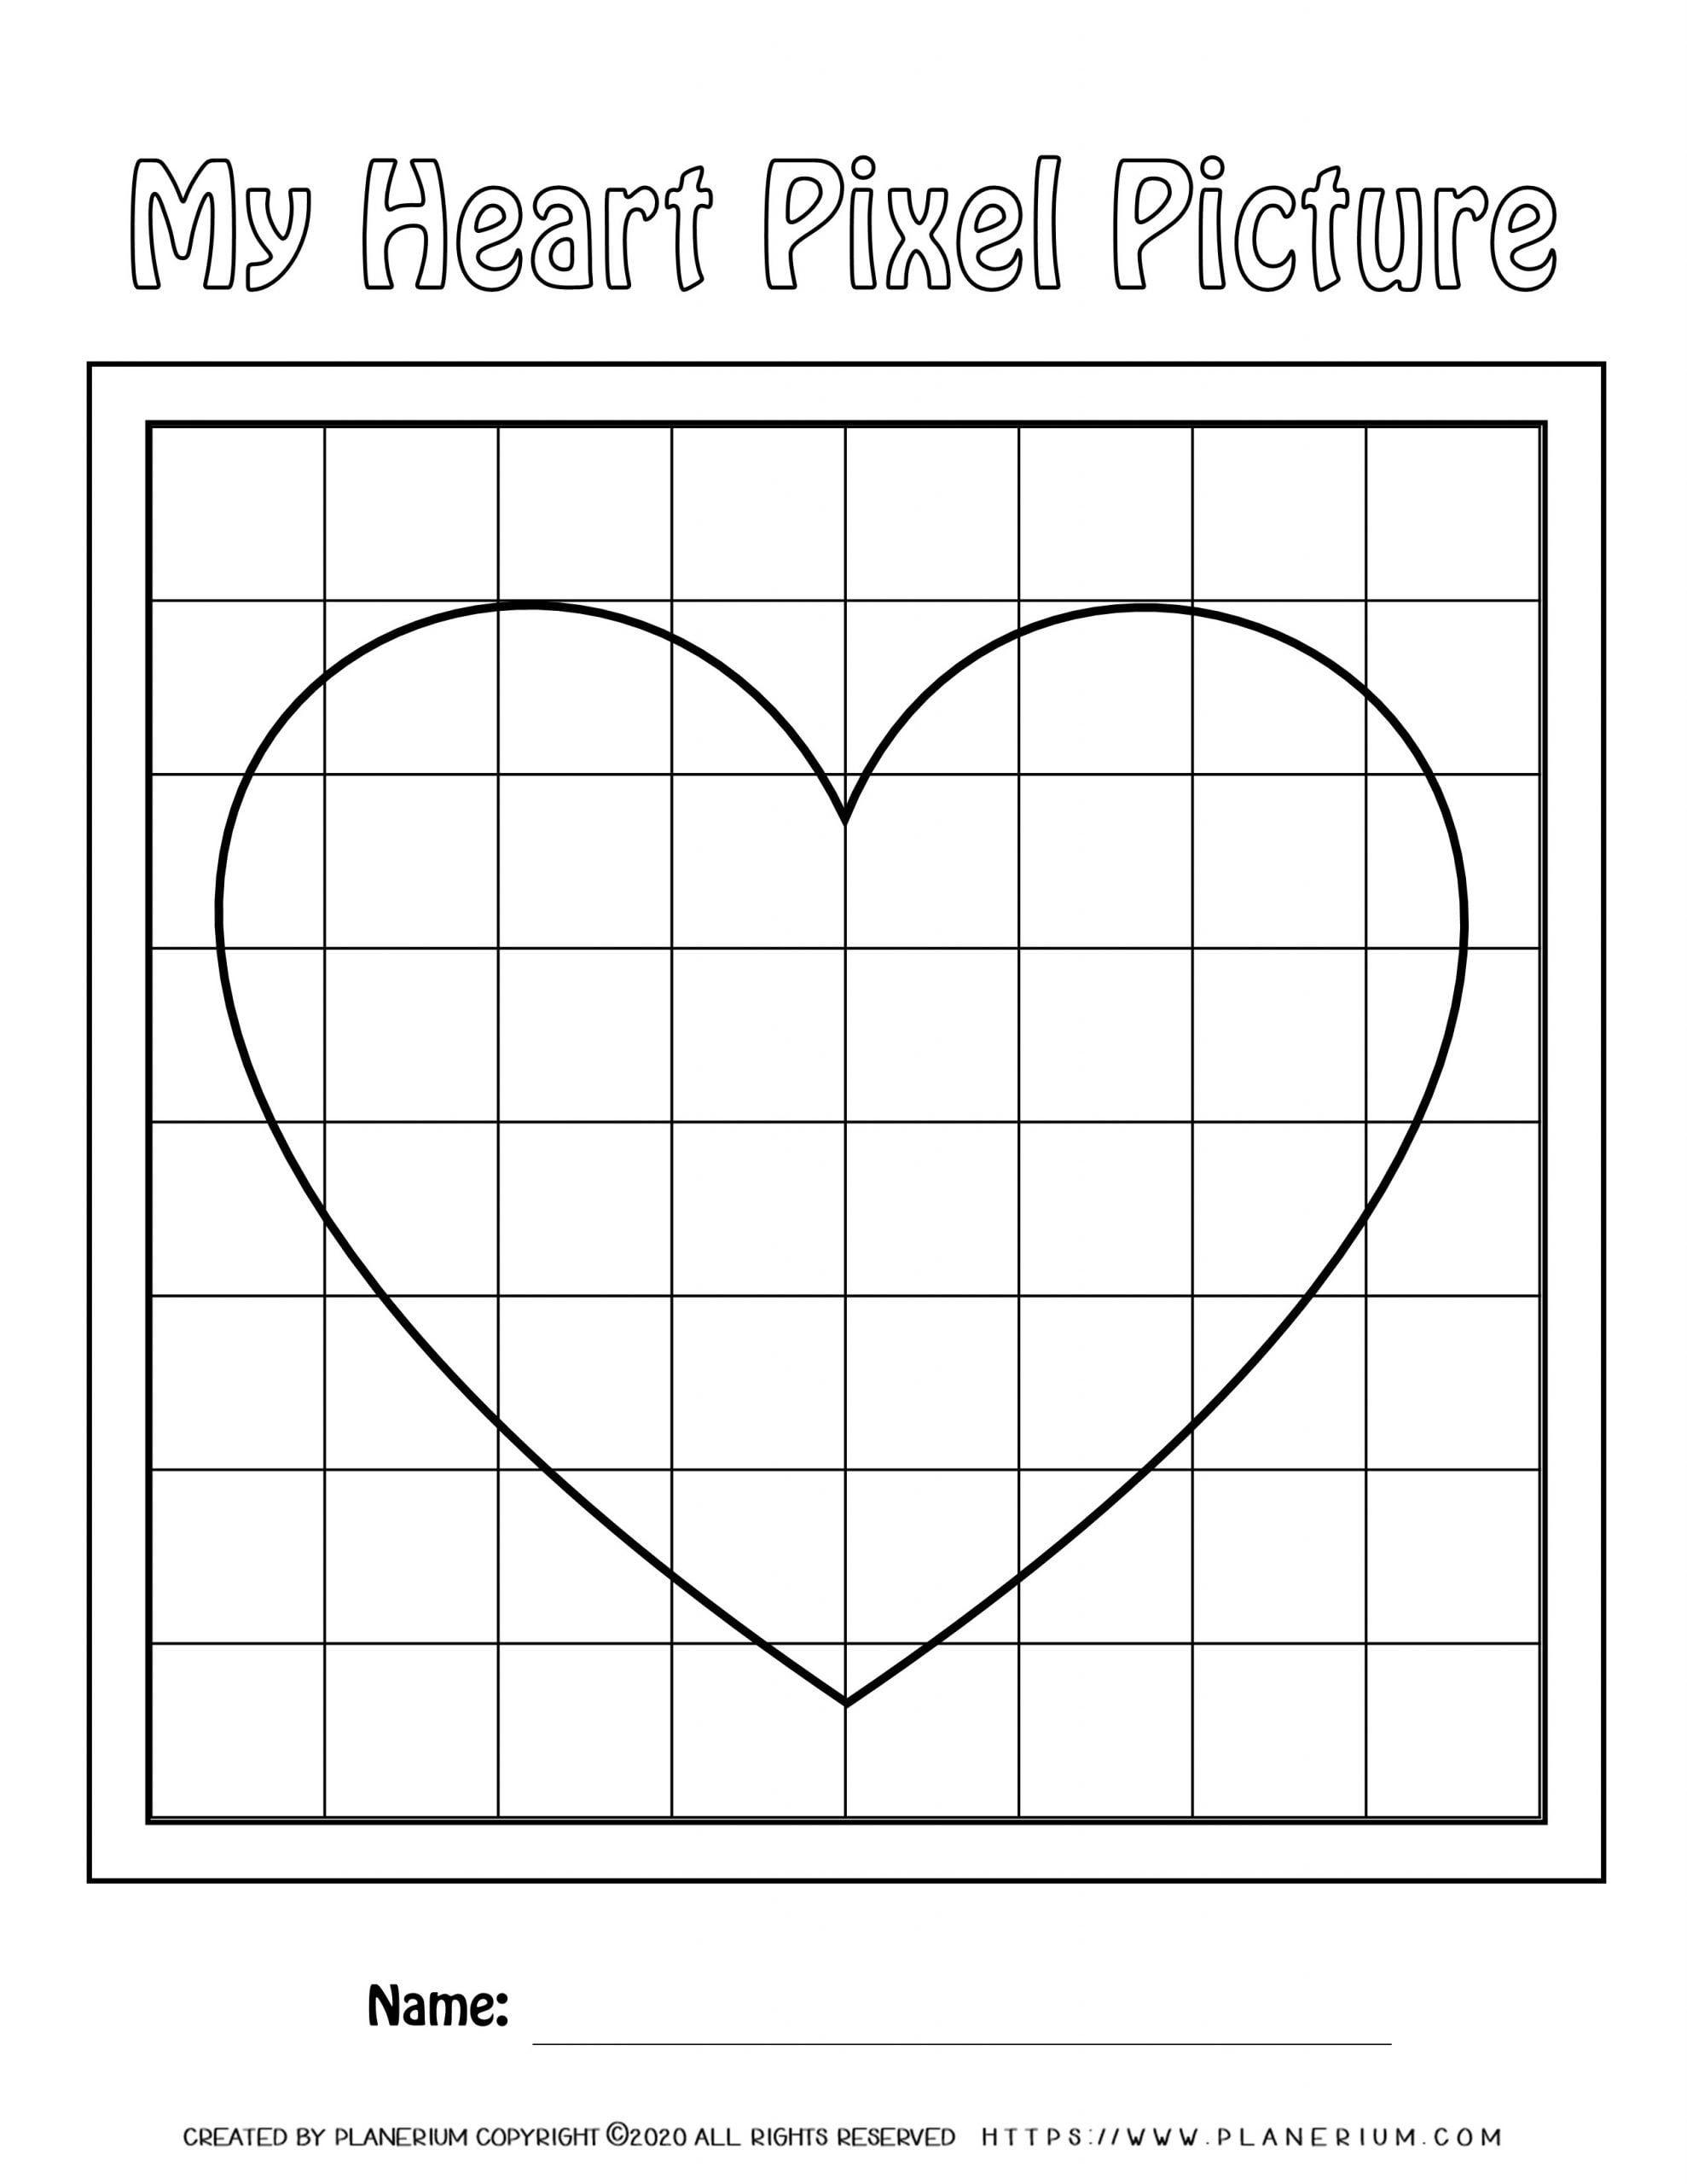 Valentines Day Worksheet - Big Heart on Medium grid